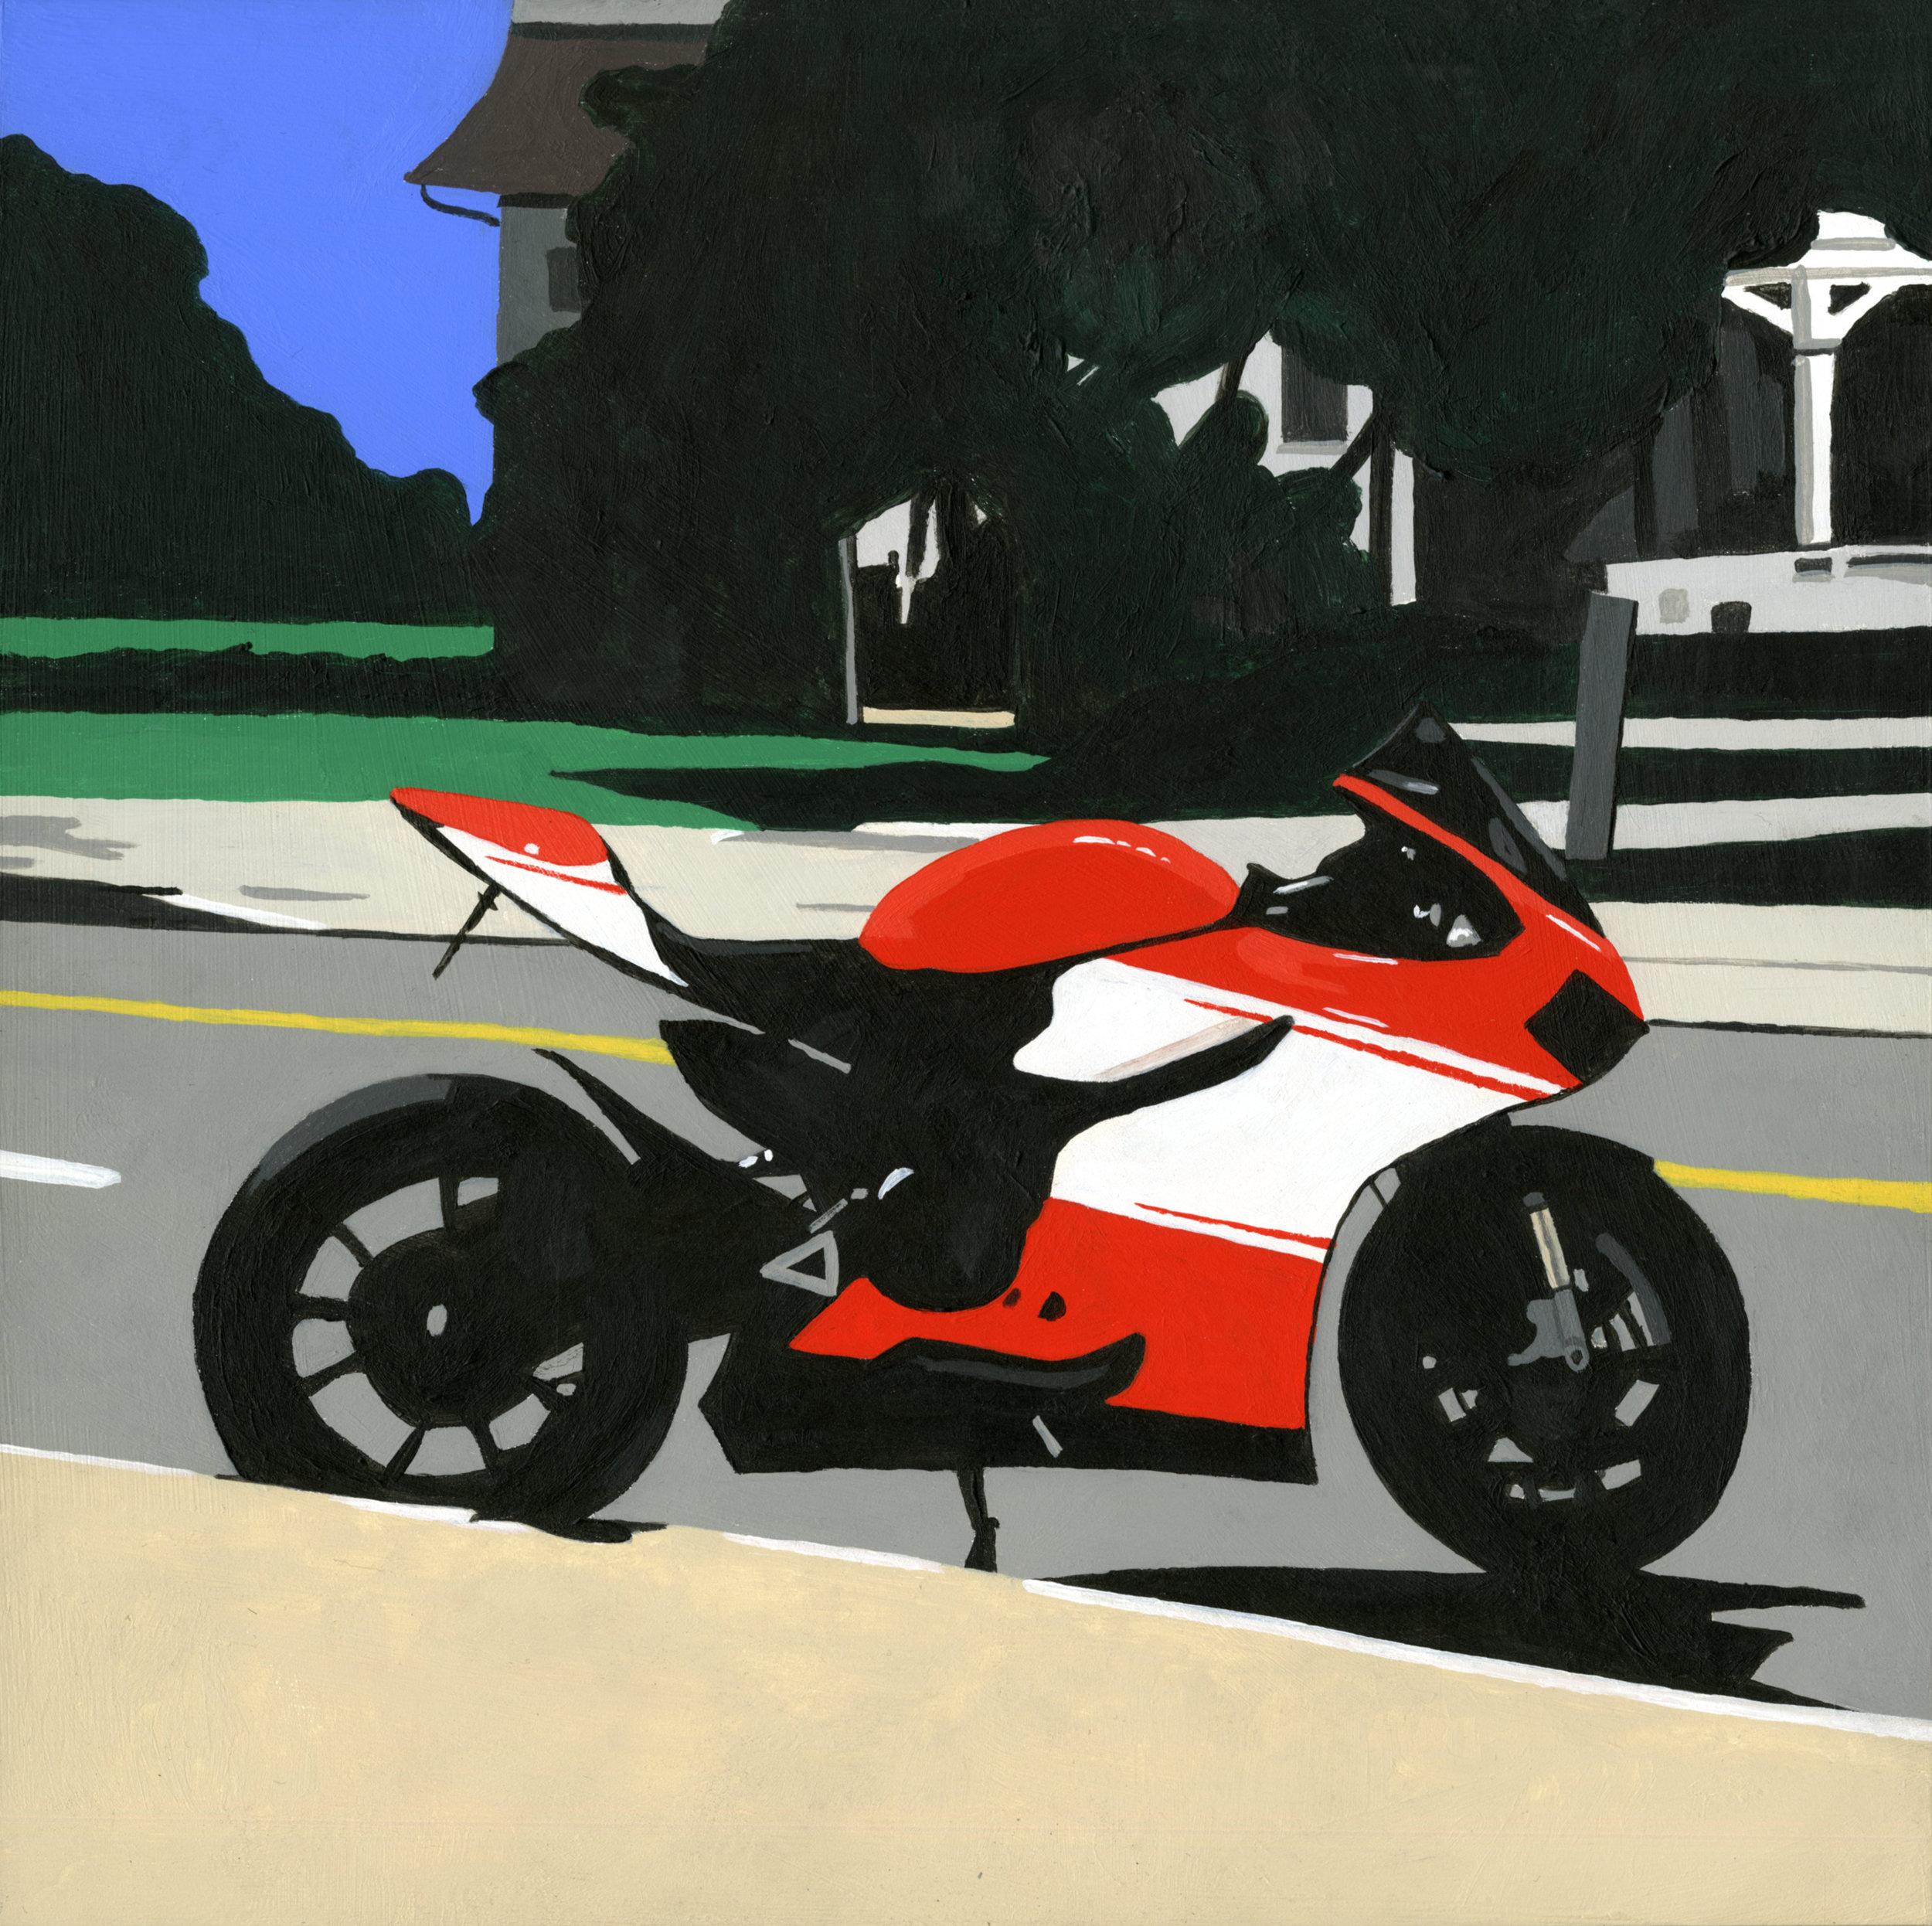 "Ducati, 2015, Acrylic on panel. 12"" x 12"""